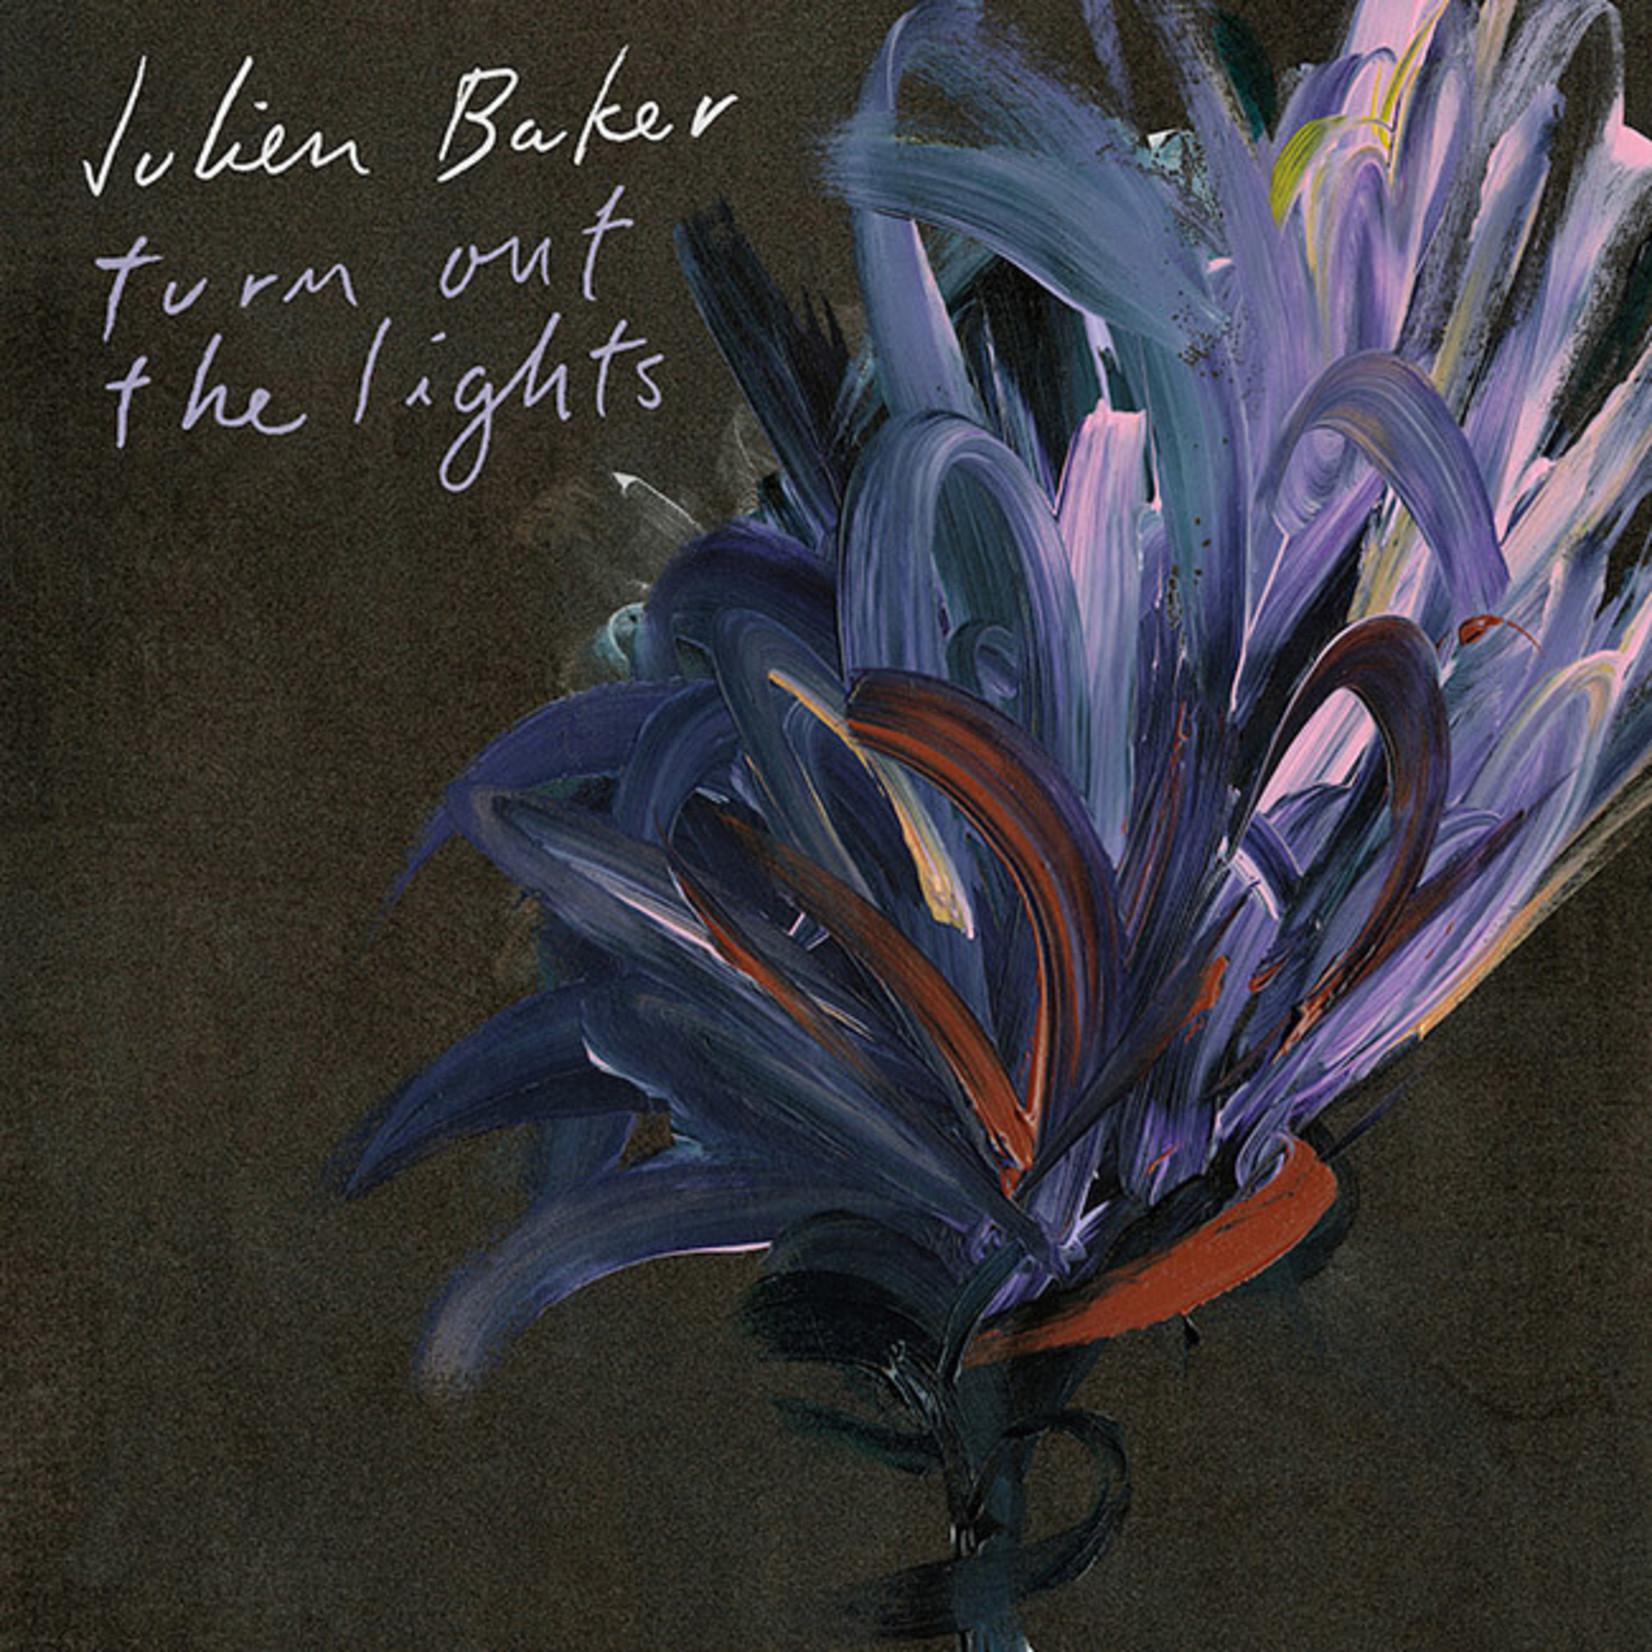 [New] Baker, Julien: Turn Out the Lights